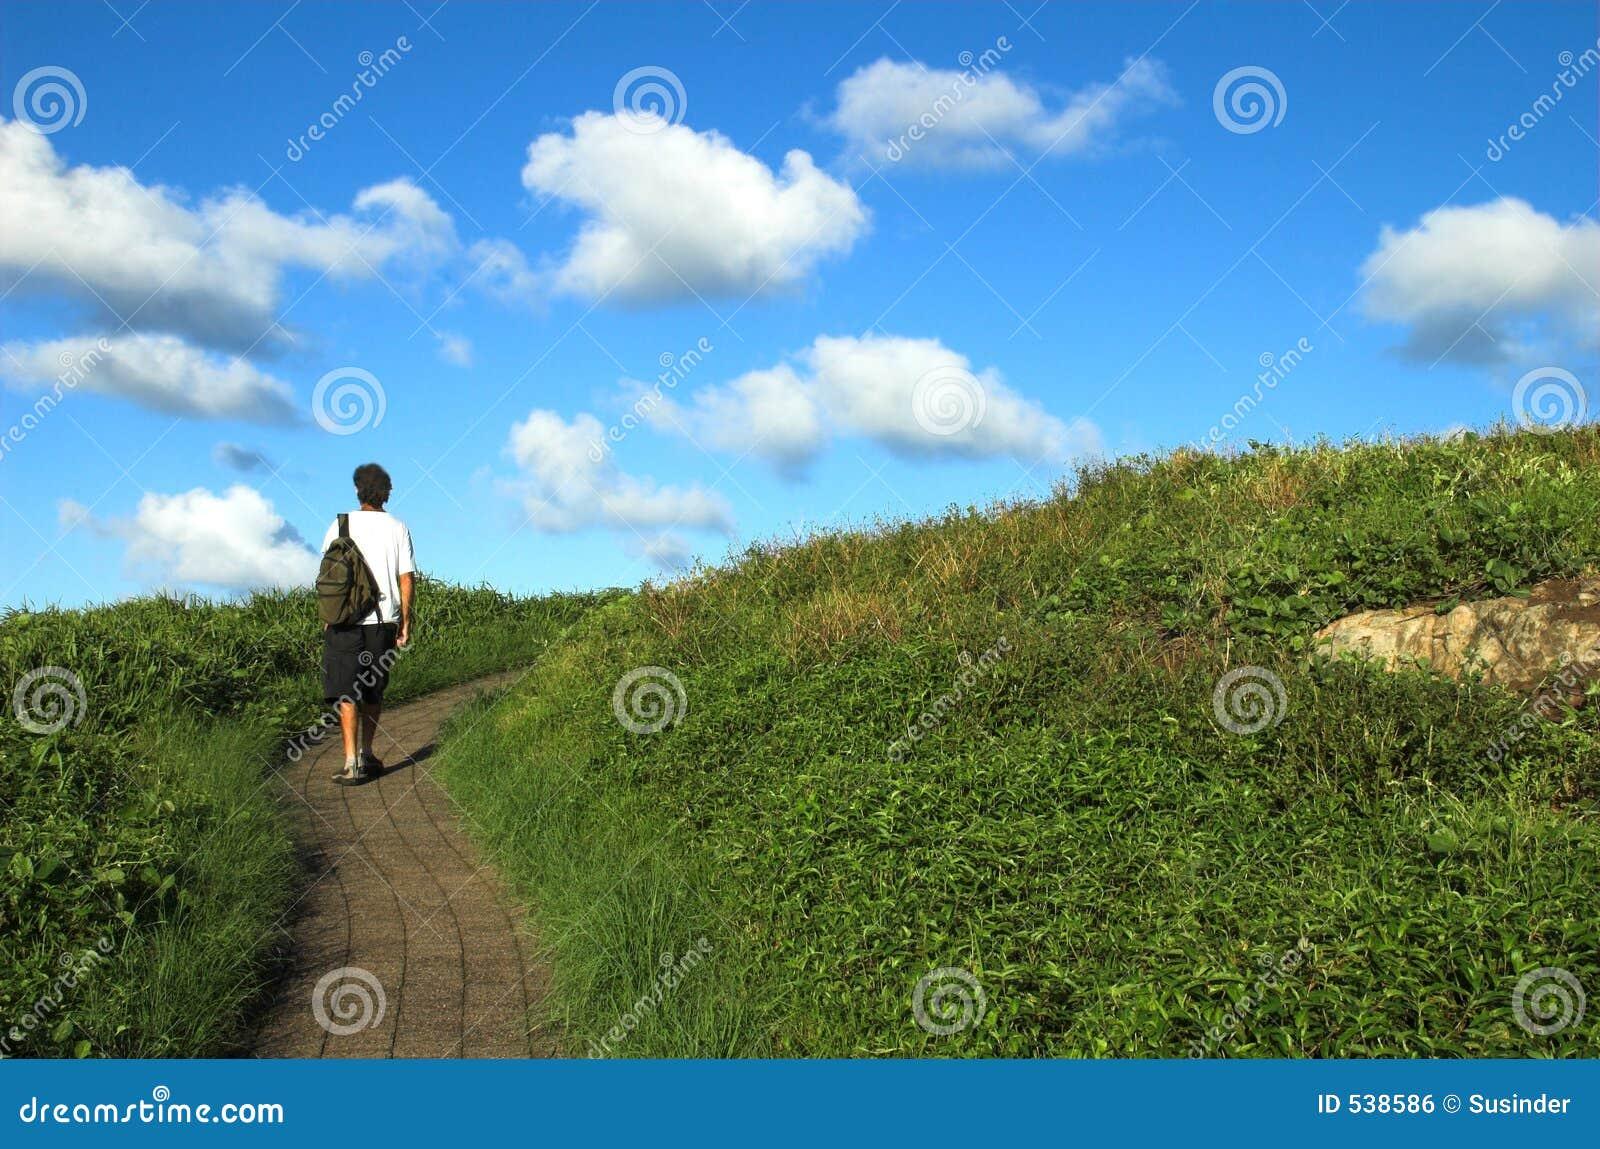 Download 梦想按照您 库存照片. 图片 包括有 成功, 天空, 概念性, 到达, 目标, 云彩, 梦想, 上升, 活动家 - 538586